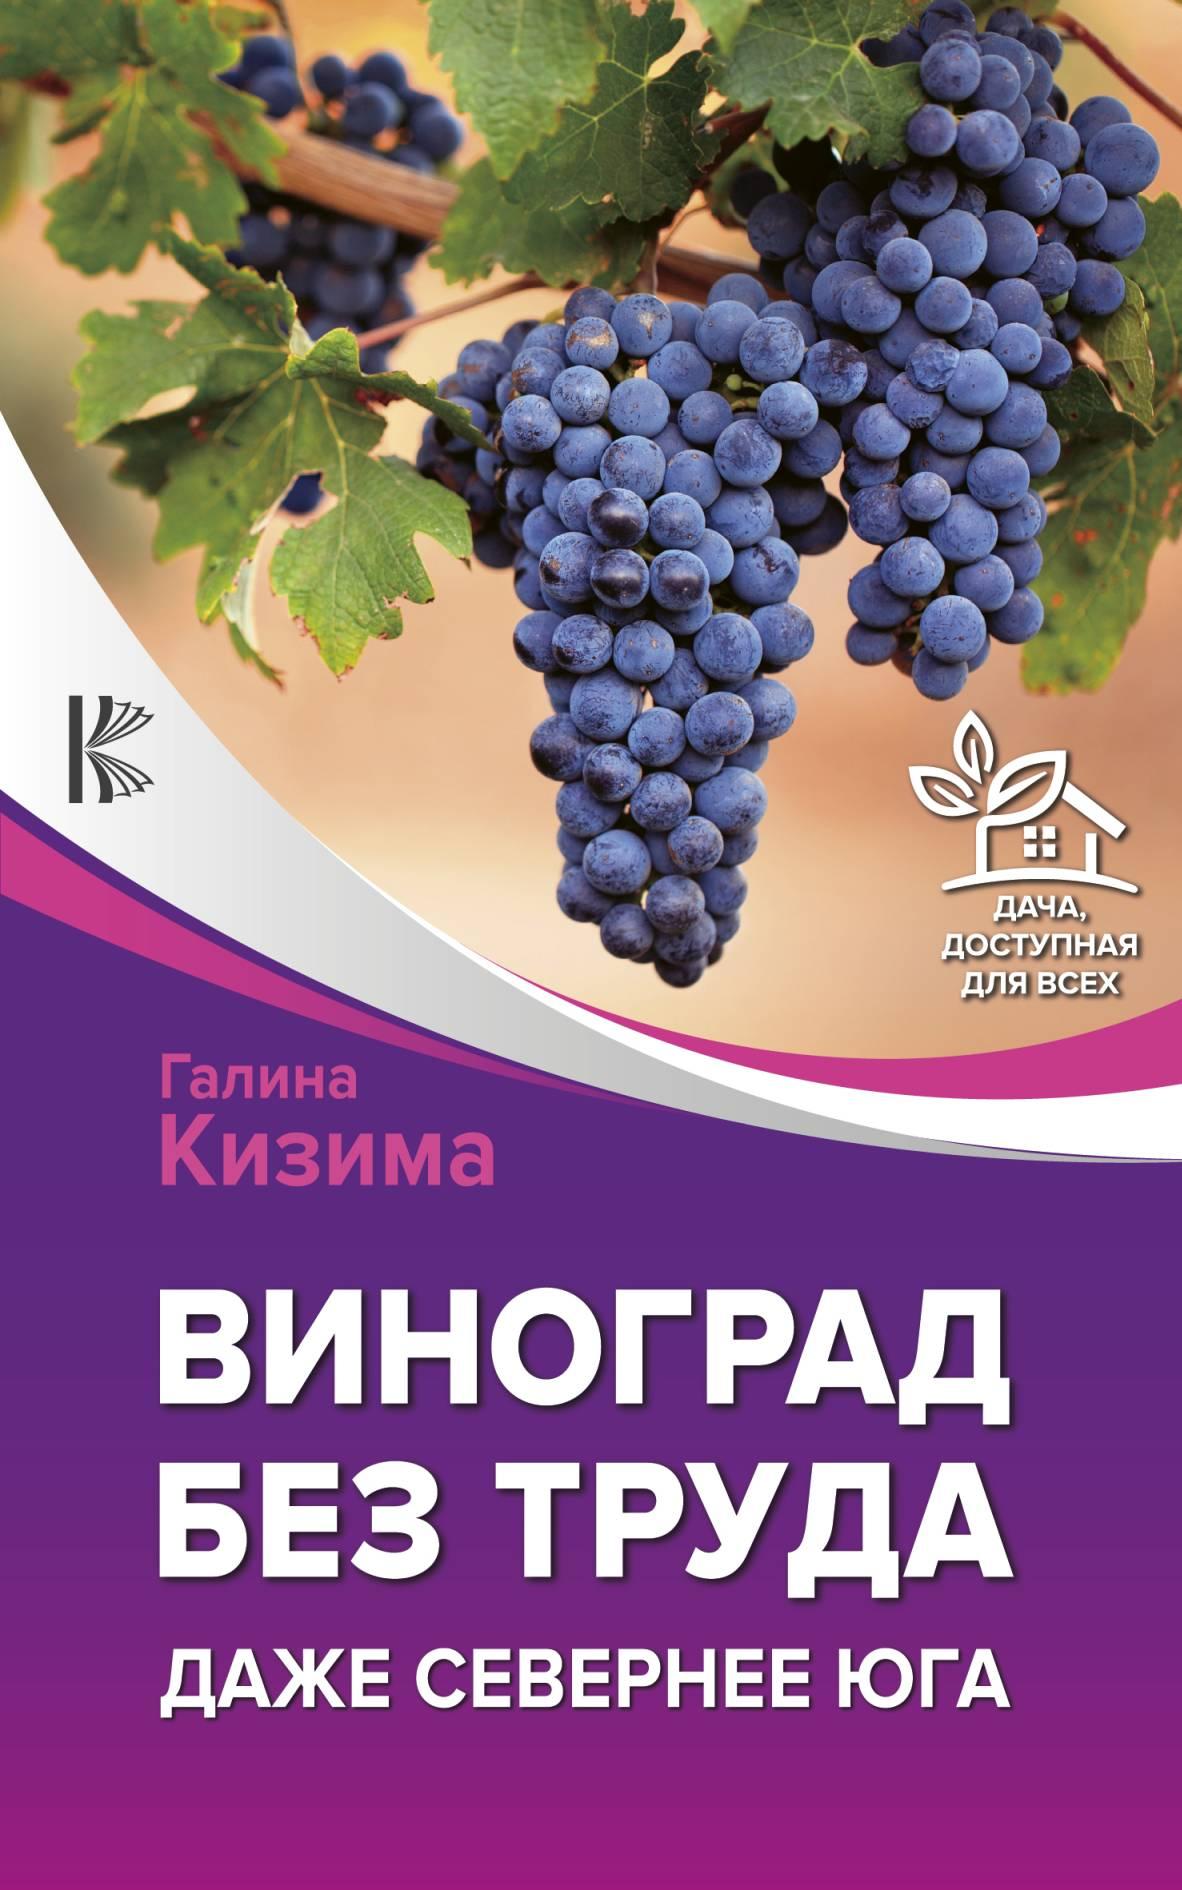 Галина Кизима Виноград – это просто! Российские виноградники от юга до севера цена